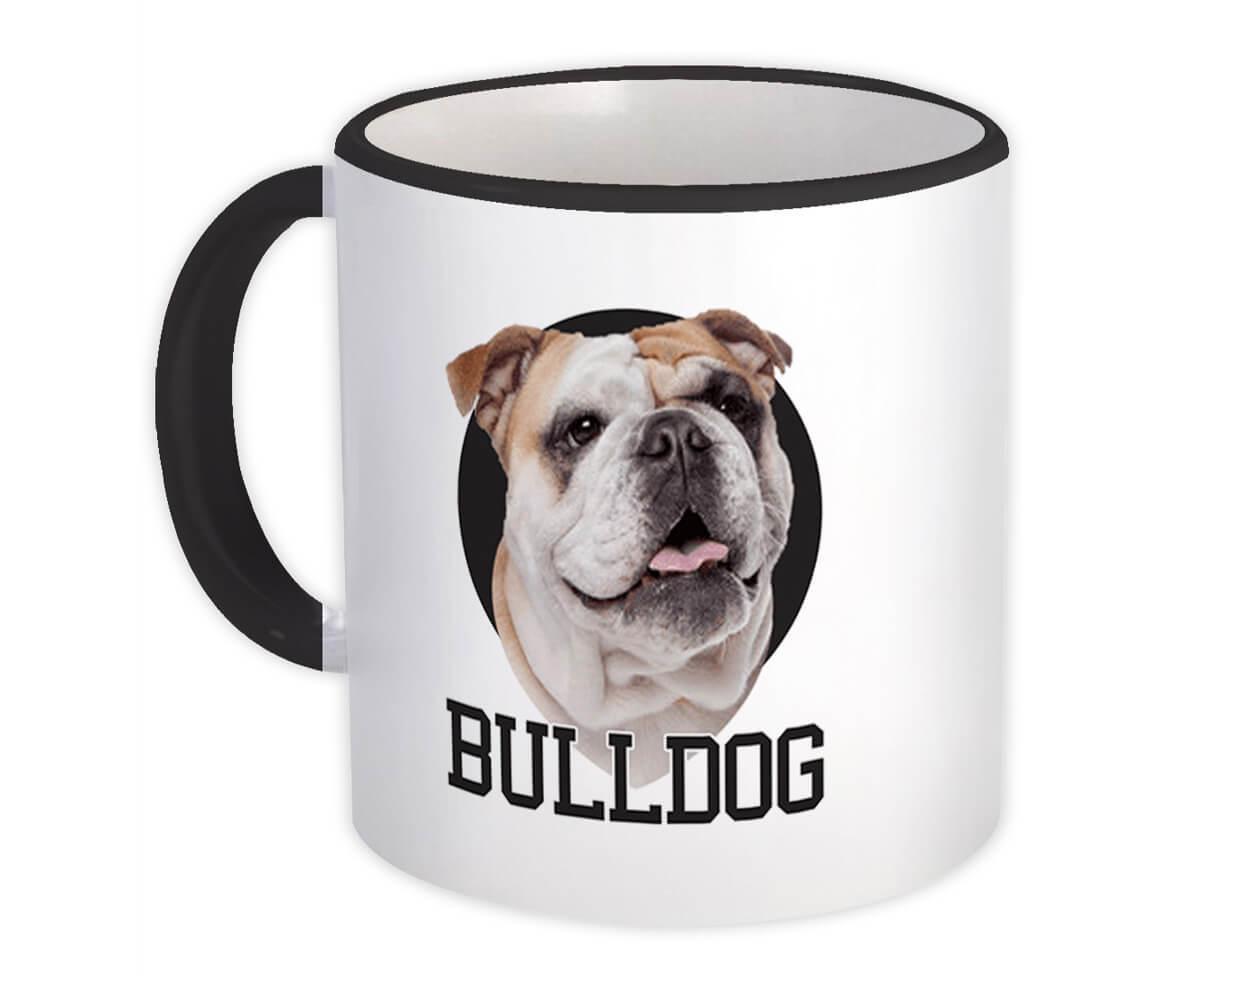 Bulldog : Gift Mug Dog Lover Face Owner Pet Cute Animal